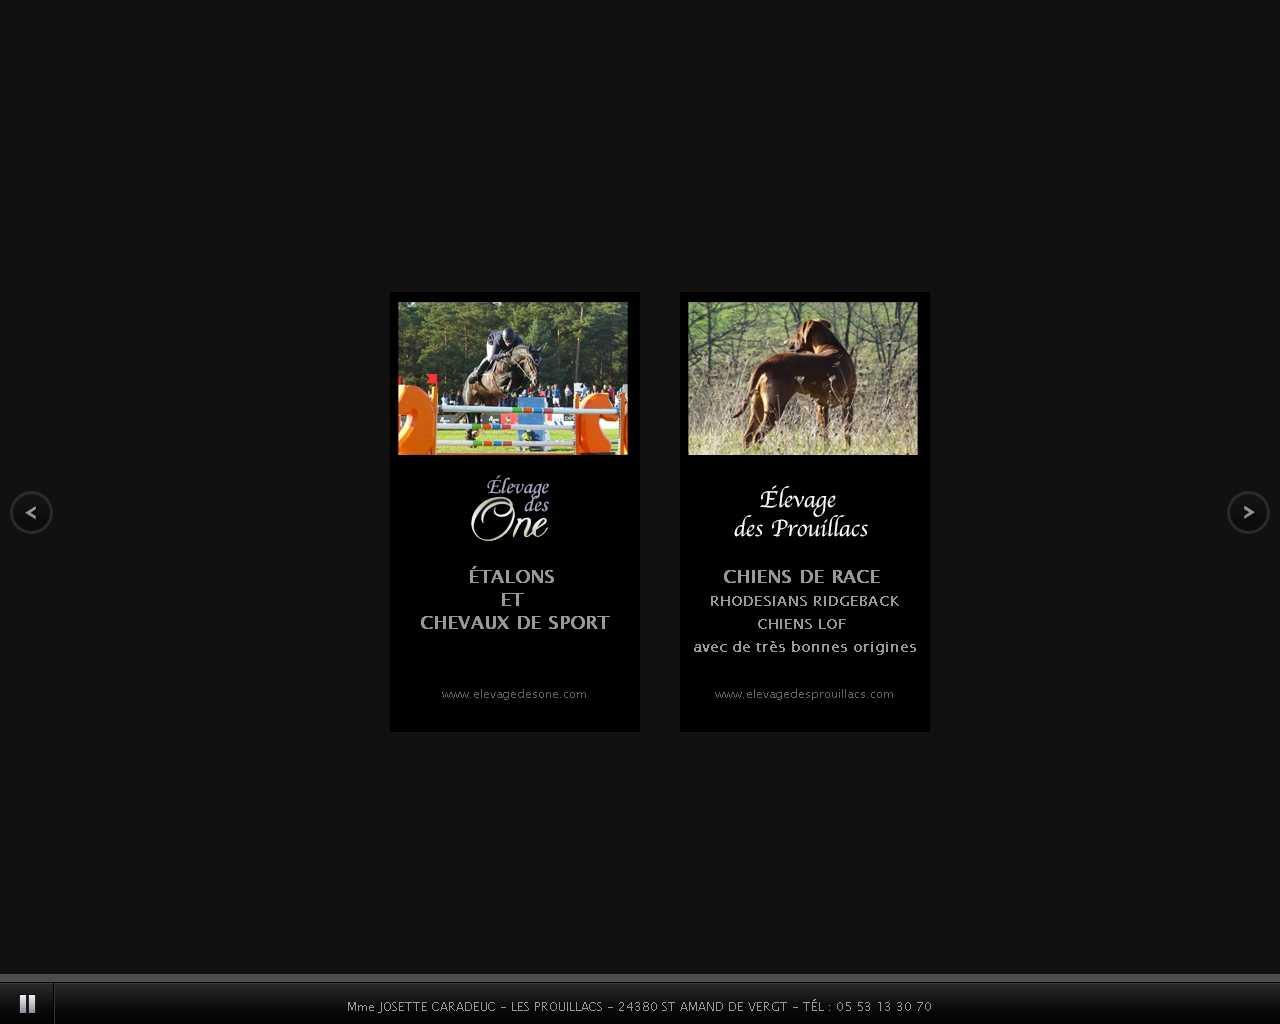 Visuel du site Elevage des One